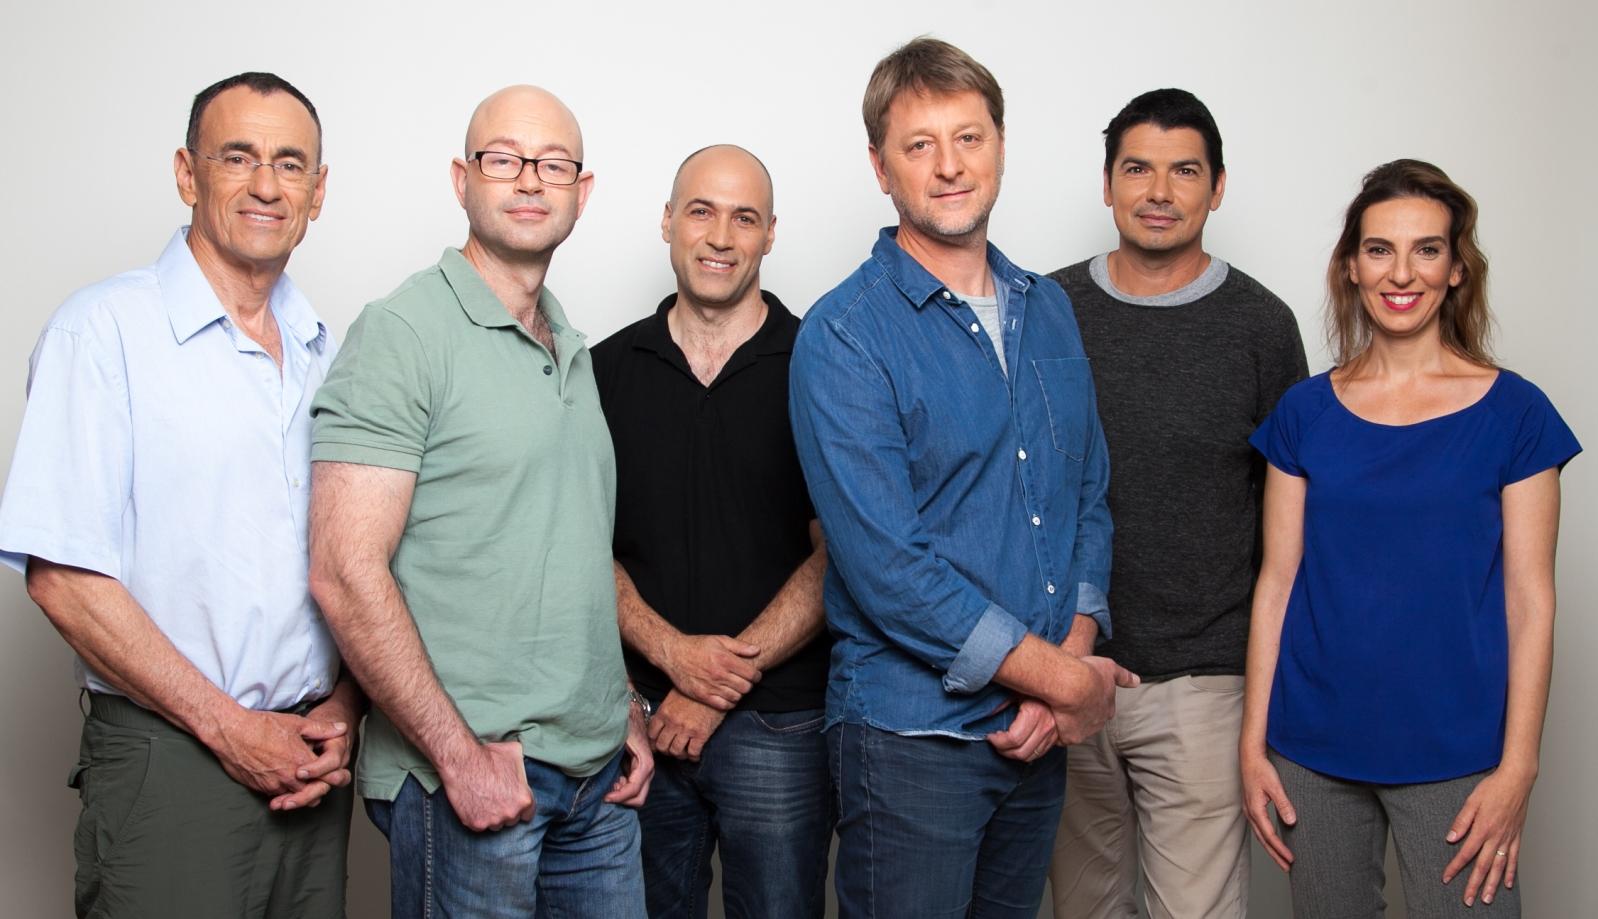 The DeepOptics team, with CEO Yariv Haddad in center. Photo by Noa Zeni